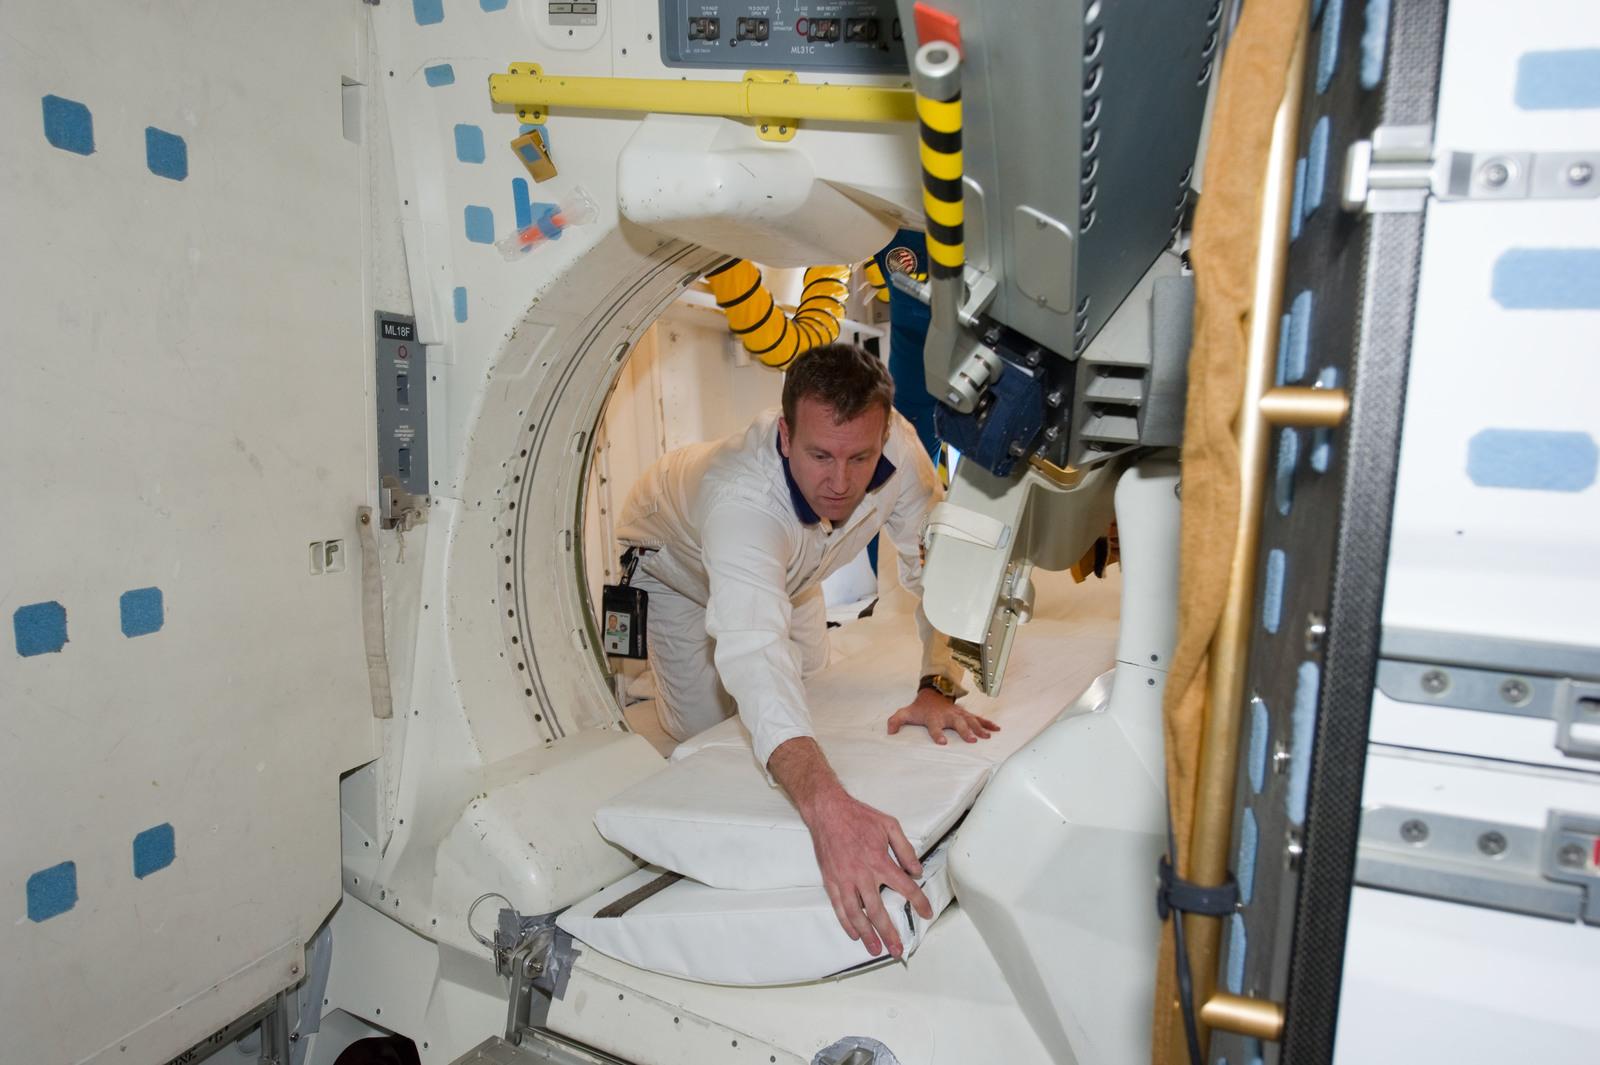 s133E013586 - STS-133 - Post landing